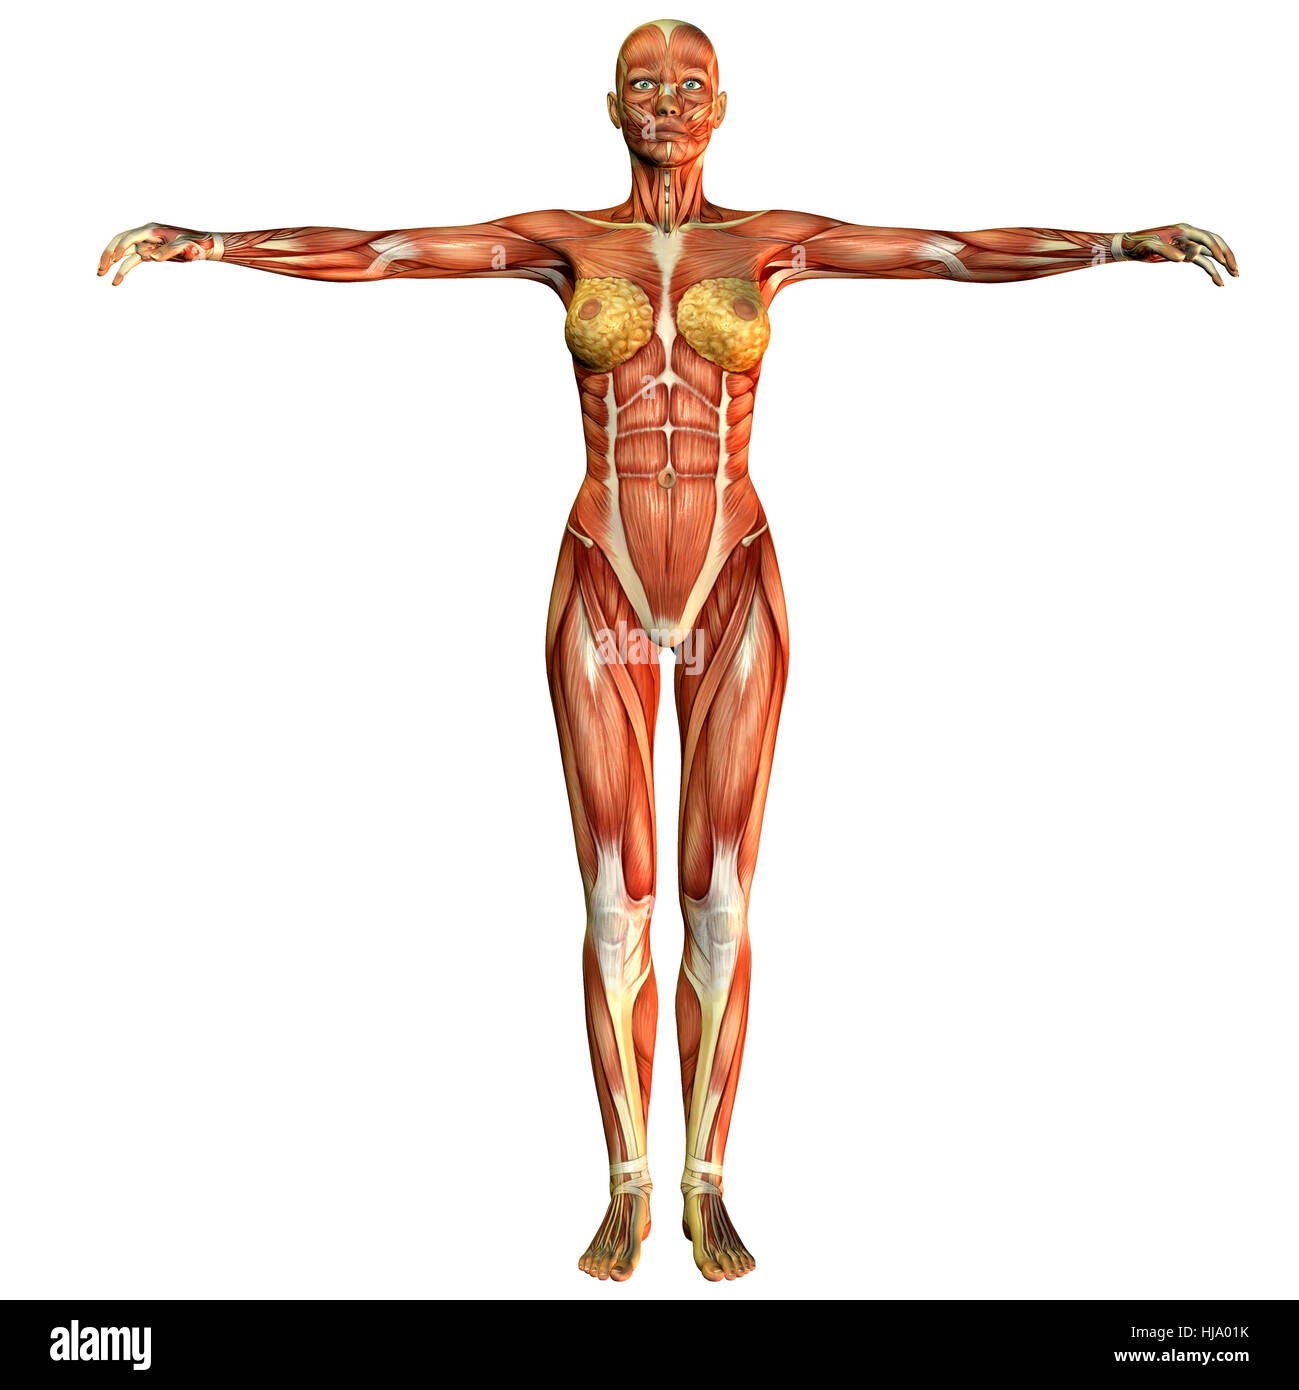 Berühmt Die Muskeln Des Körpers Bilder - Anatomie Ideen - finotti.info